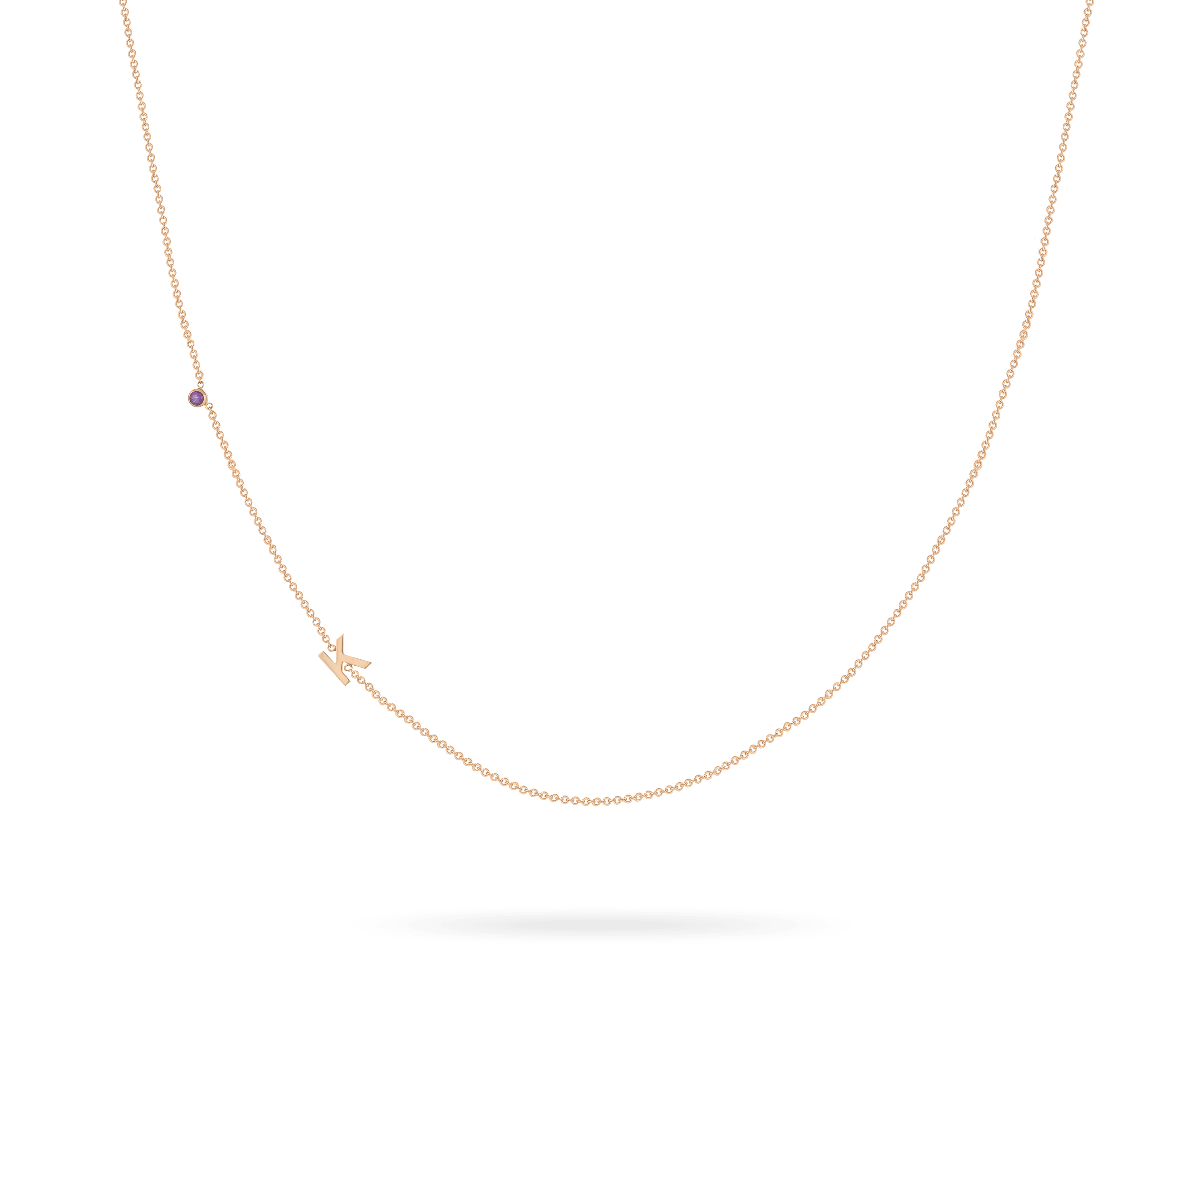 Mini Letter + Birthstone Necklace